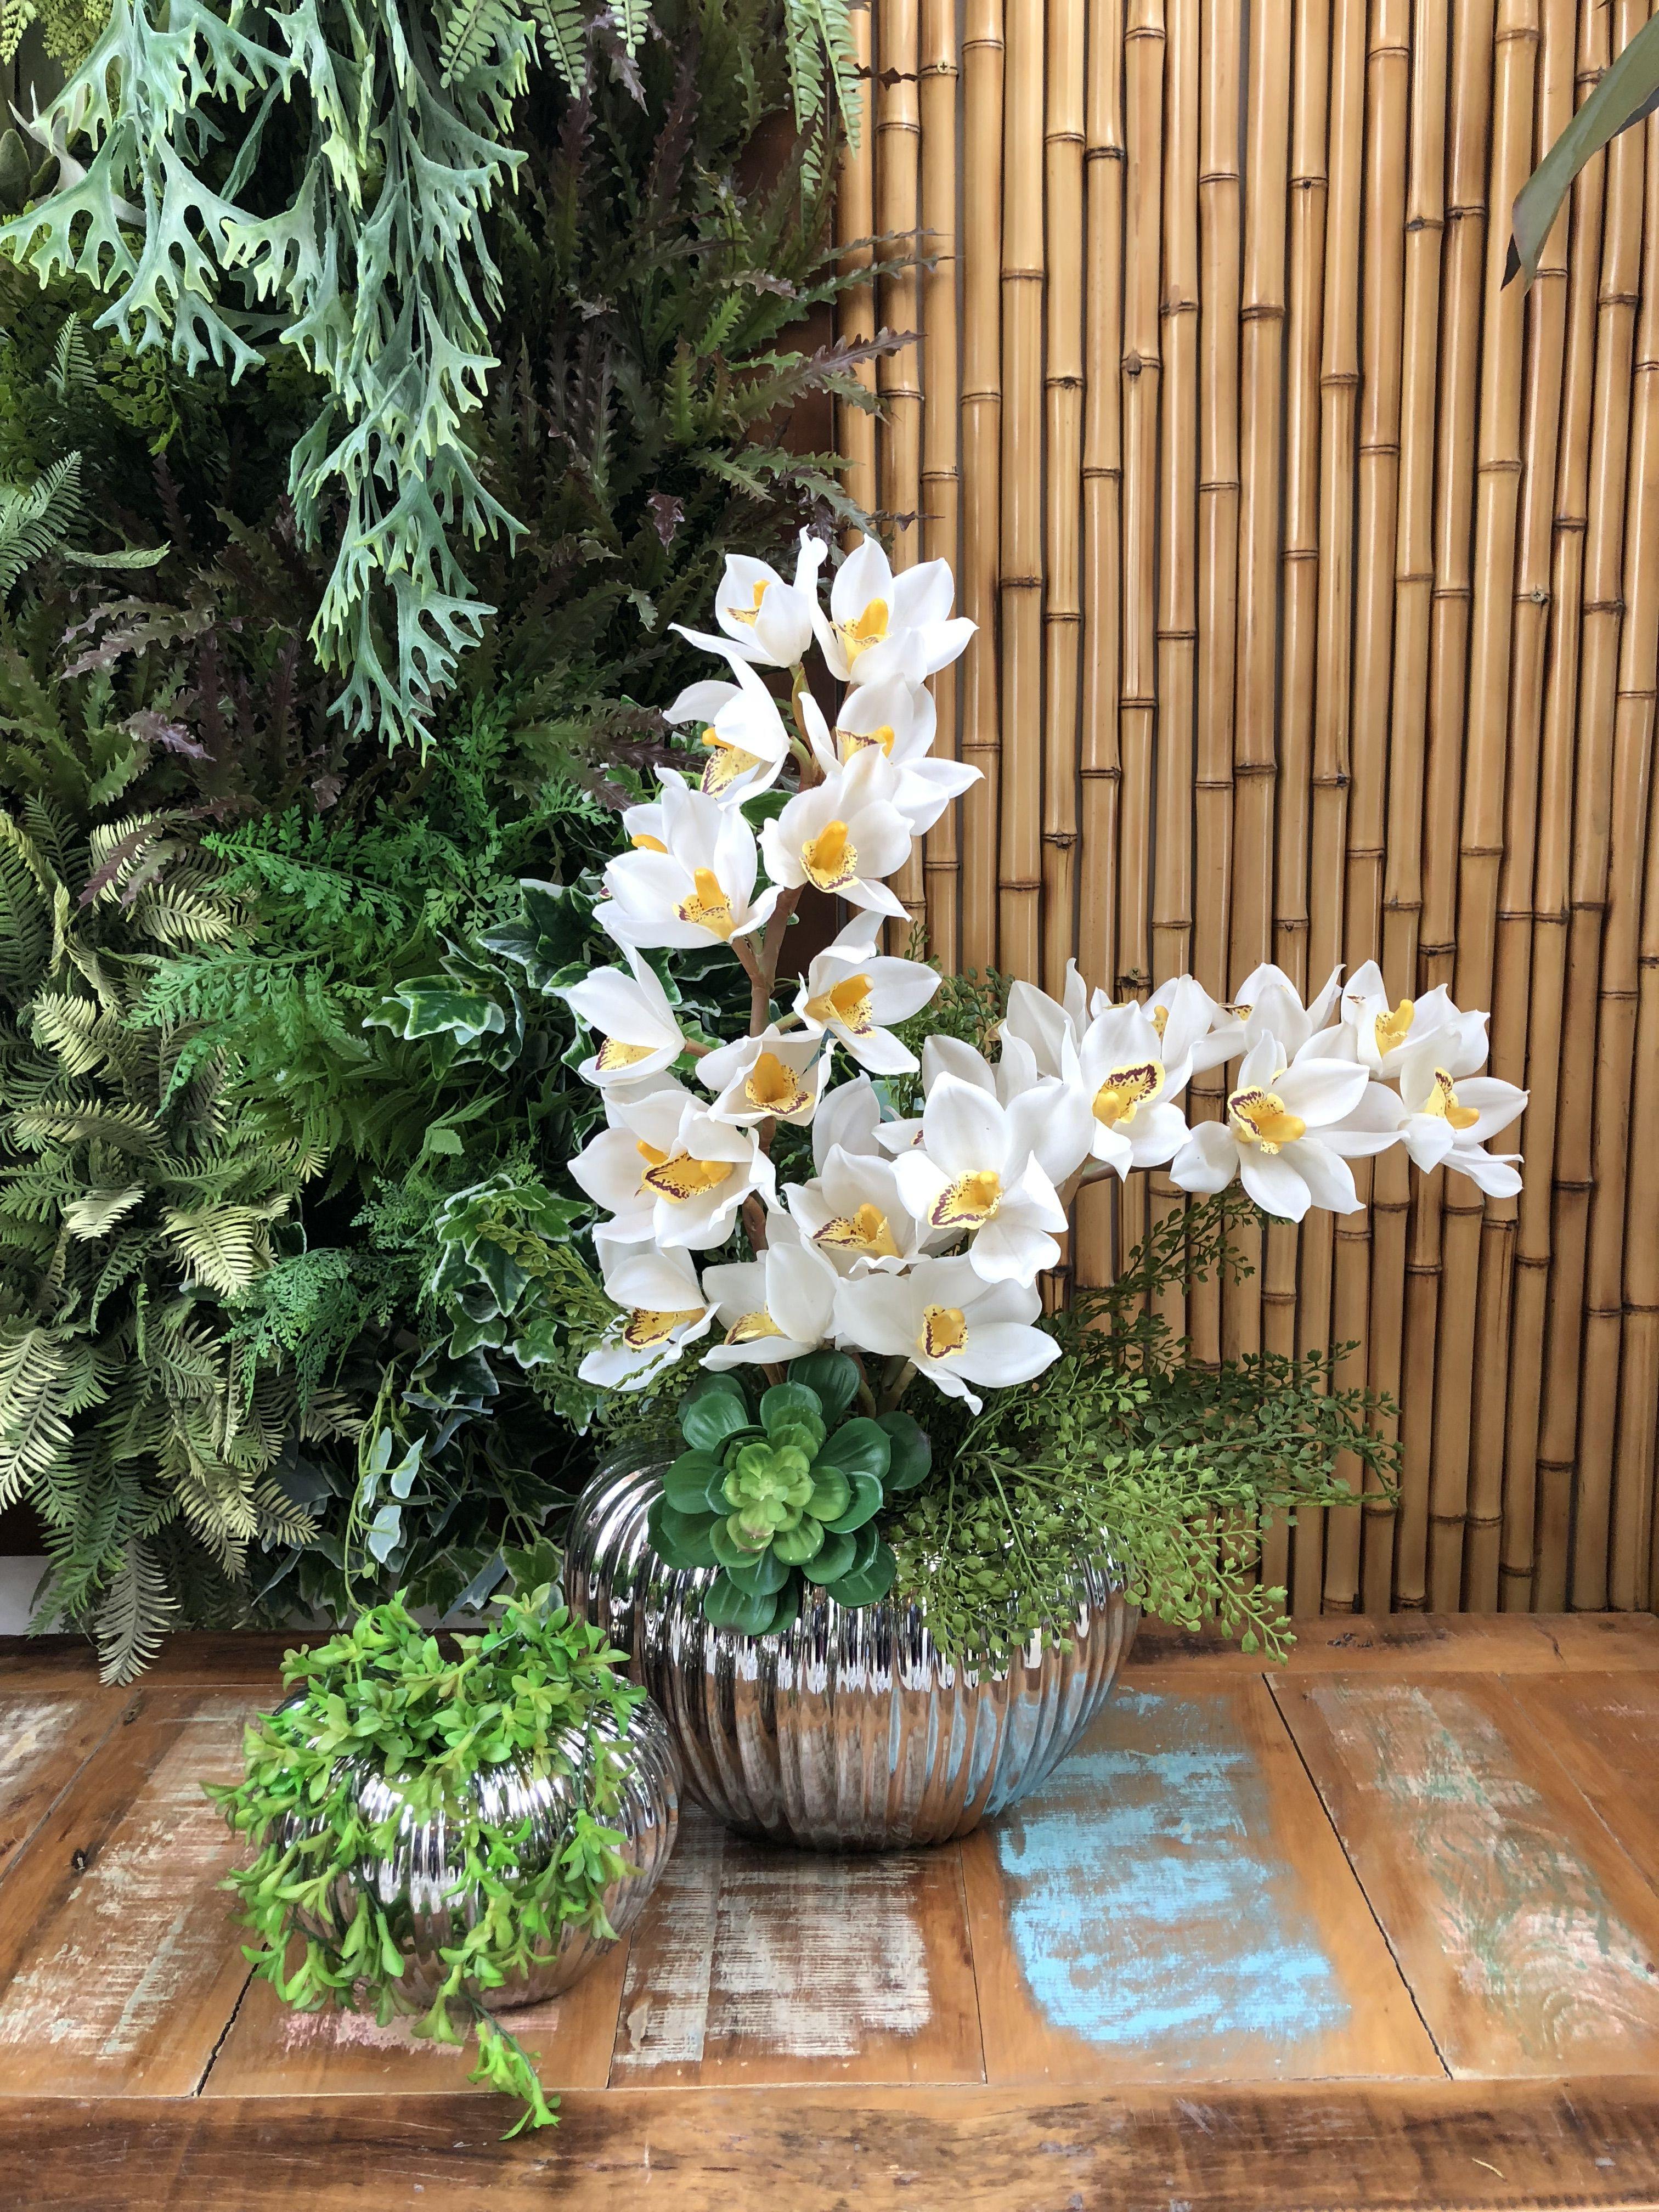 Art Lilac  Arranjos Florais, Flores Artificiais, Orqu Deas Artificiais